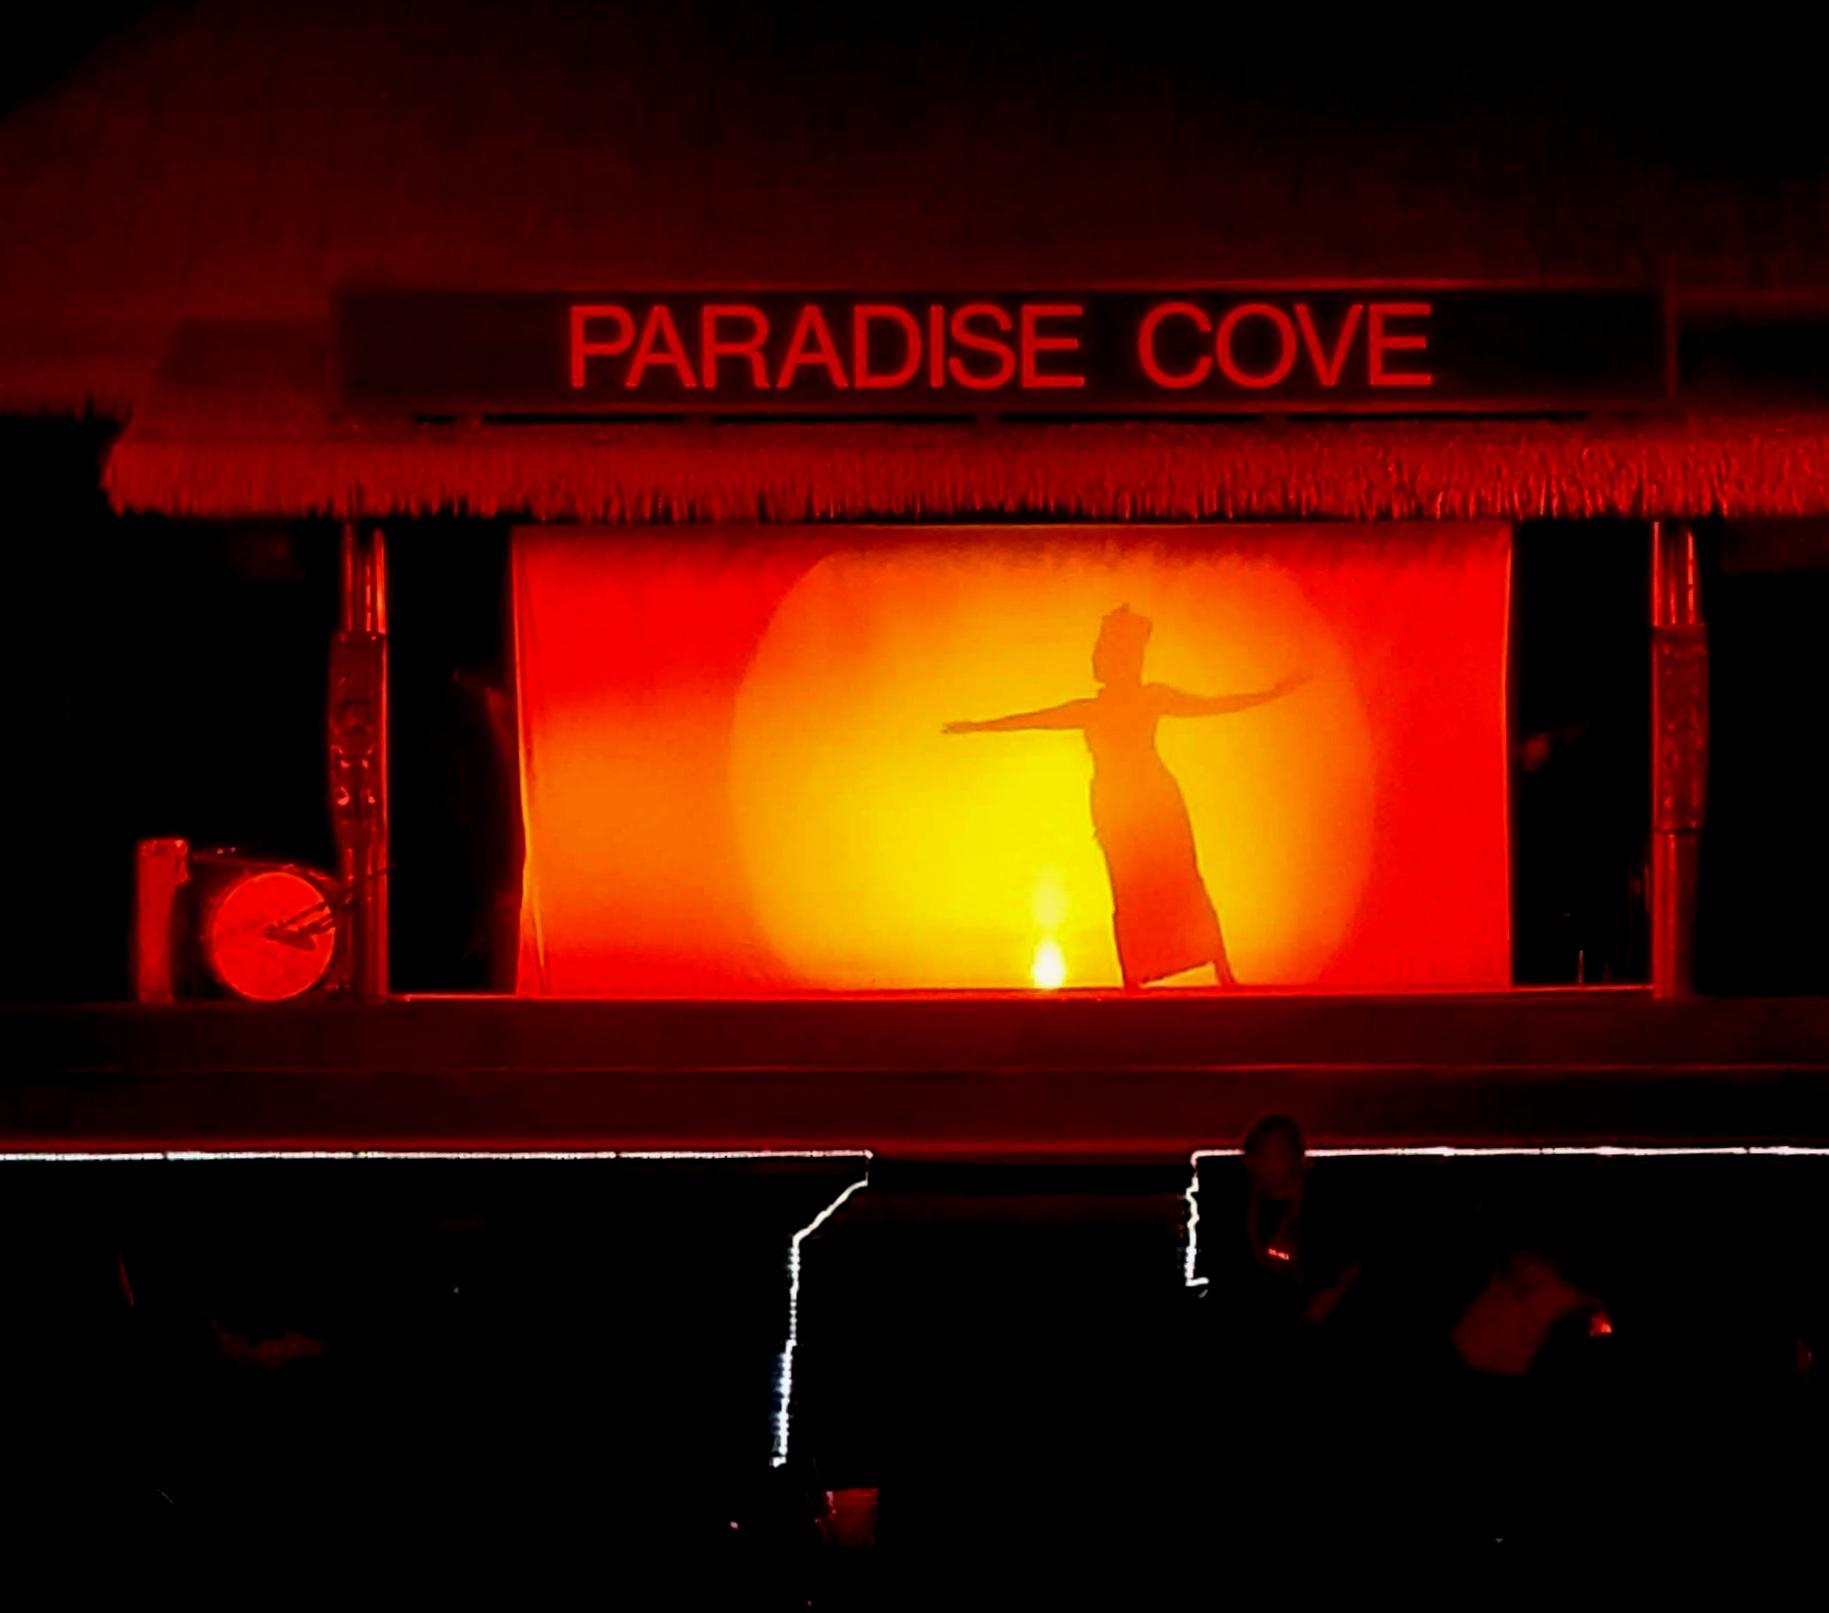 PardiseCove.jpg